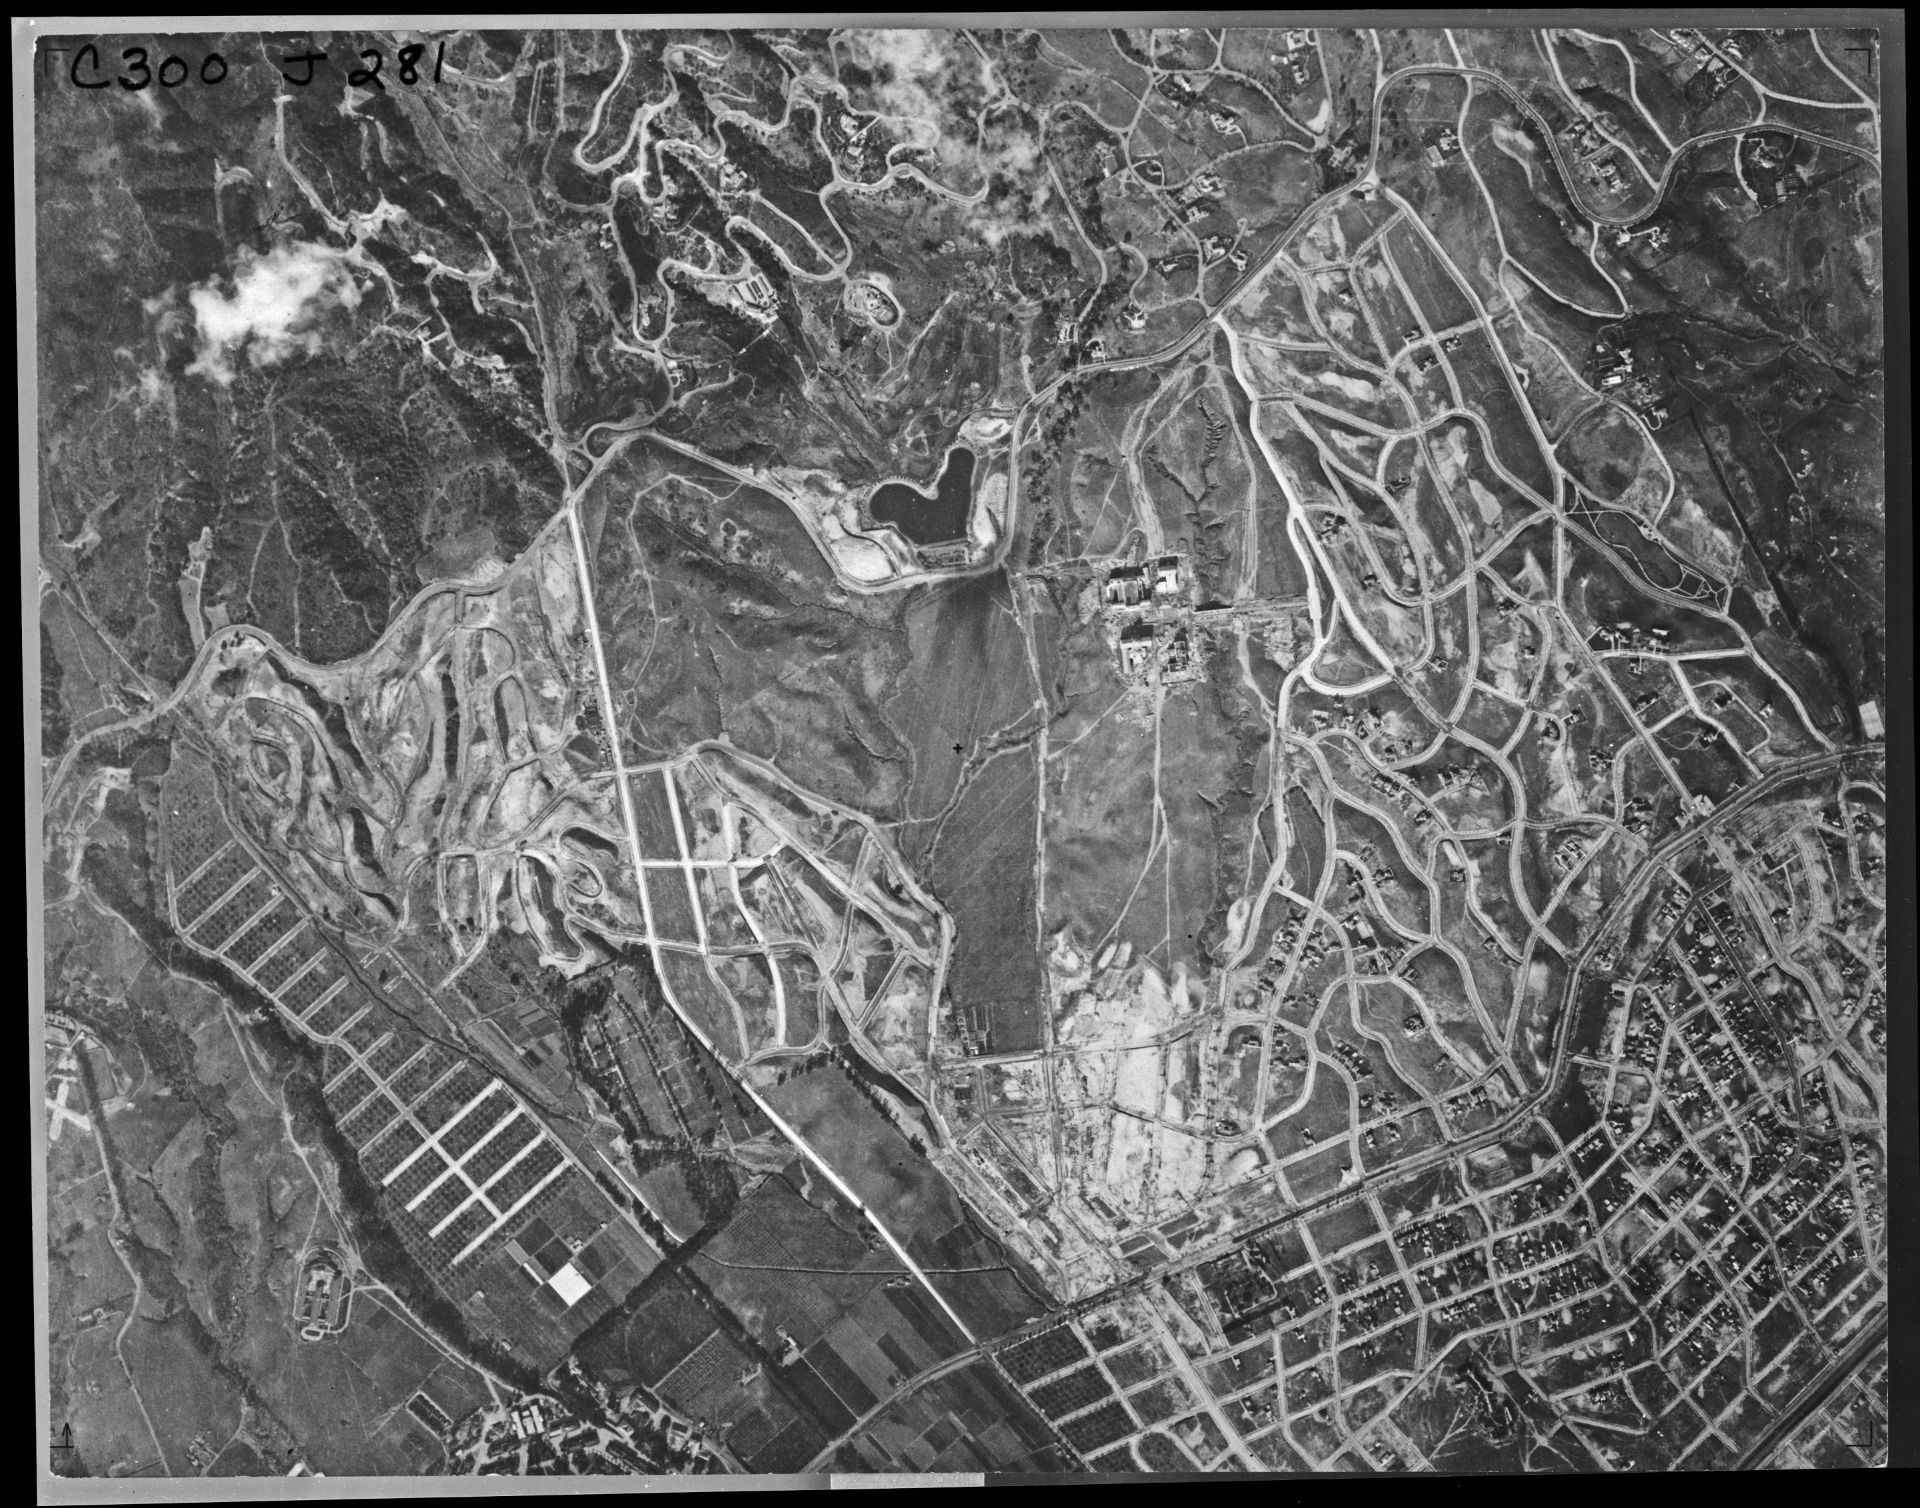 The Henry J. Bruman Map Collection's UCLA Centennial Celetion on macgowan hall ucla map, campbell hall ucla map, kaufman hall ucla map, melnitz hall ucla map, bunche hall ucla map, boelter hall ucla map, hershey hall ucla map, moore hall ucla map,